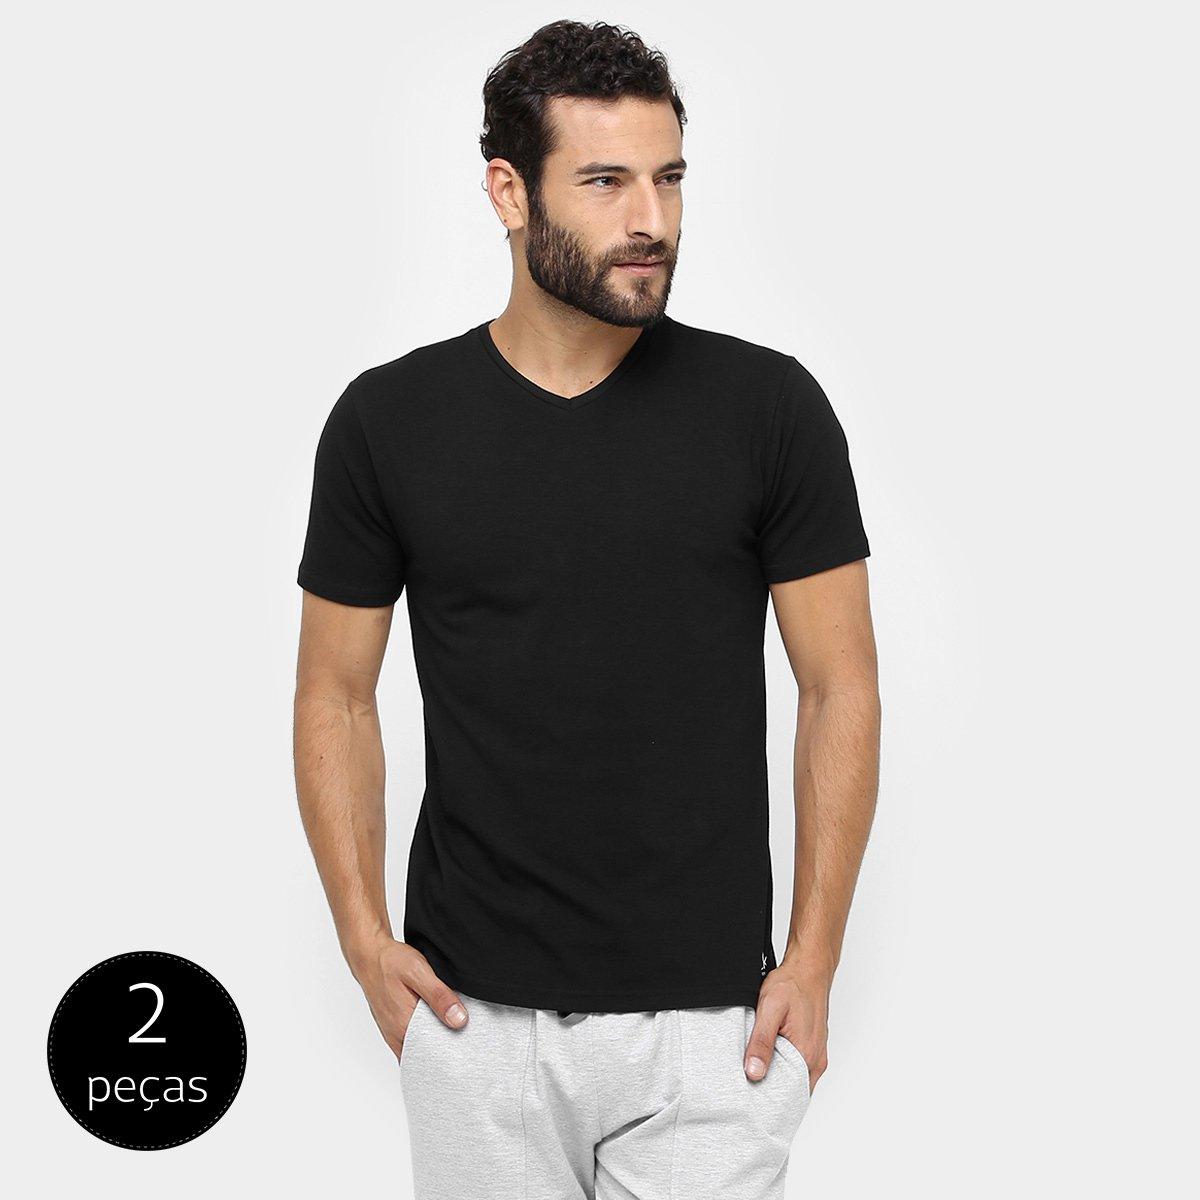 bf8c307b2f887 ... Camiseta Pijama Calvin Klein Gola V 2 Peças - Preto. ZATTINI  ZATTINI